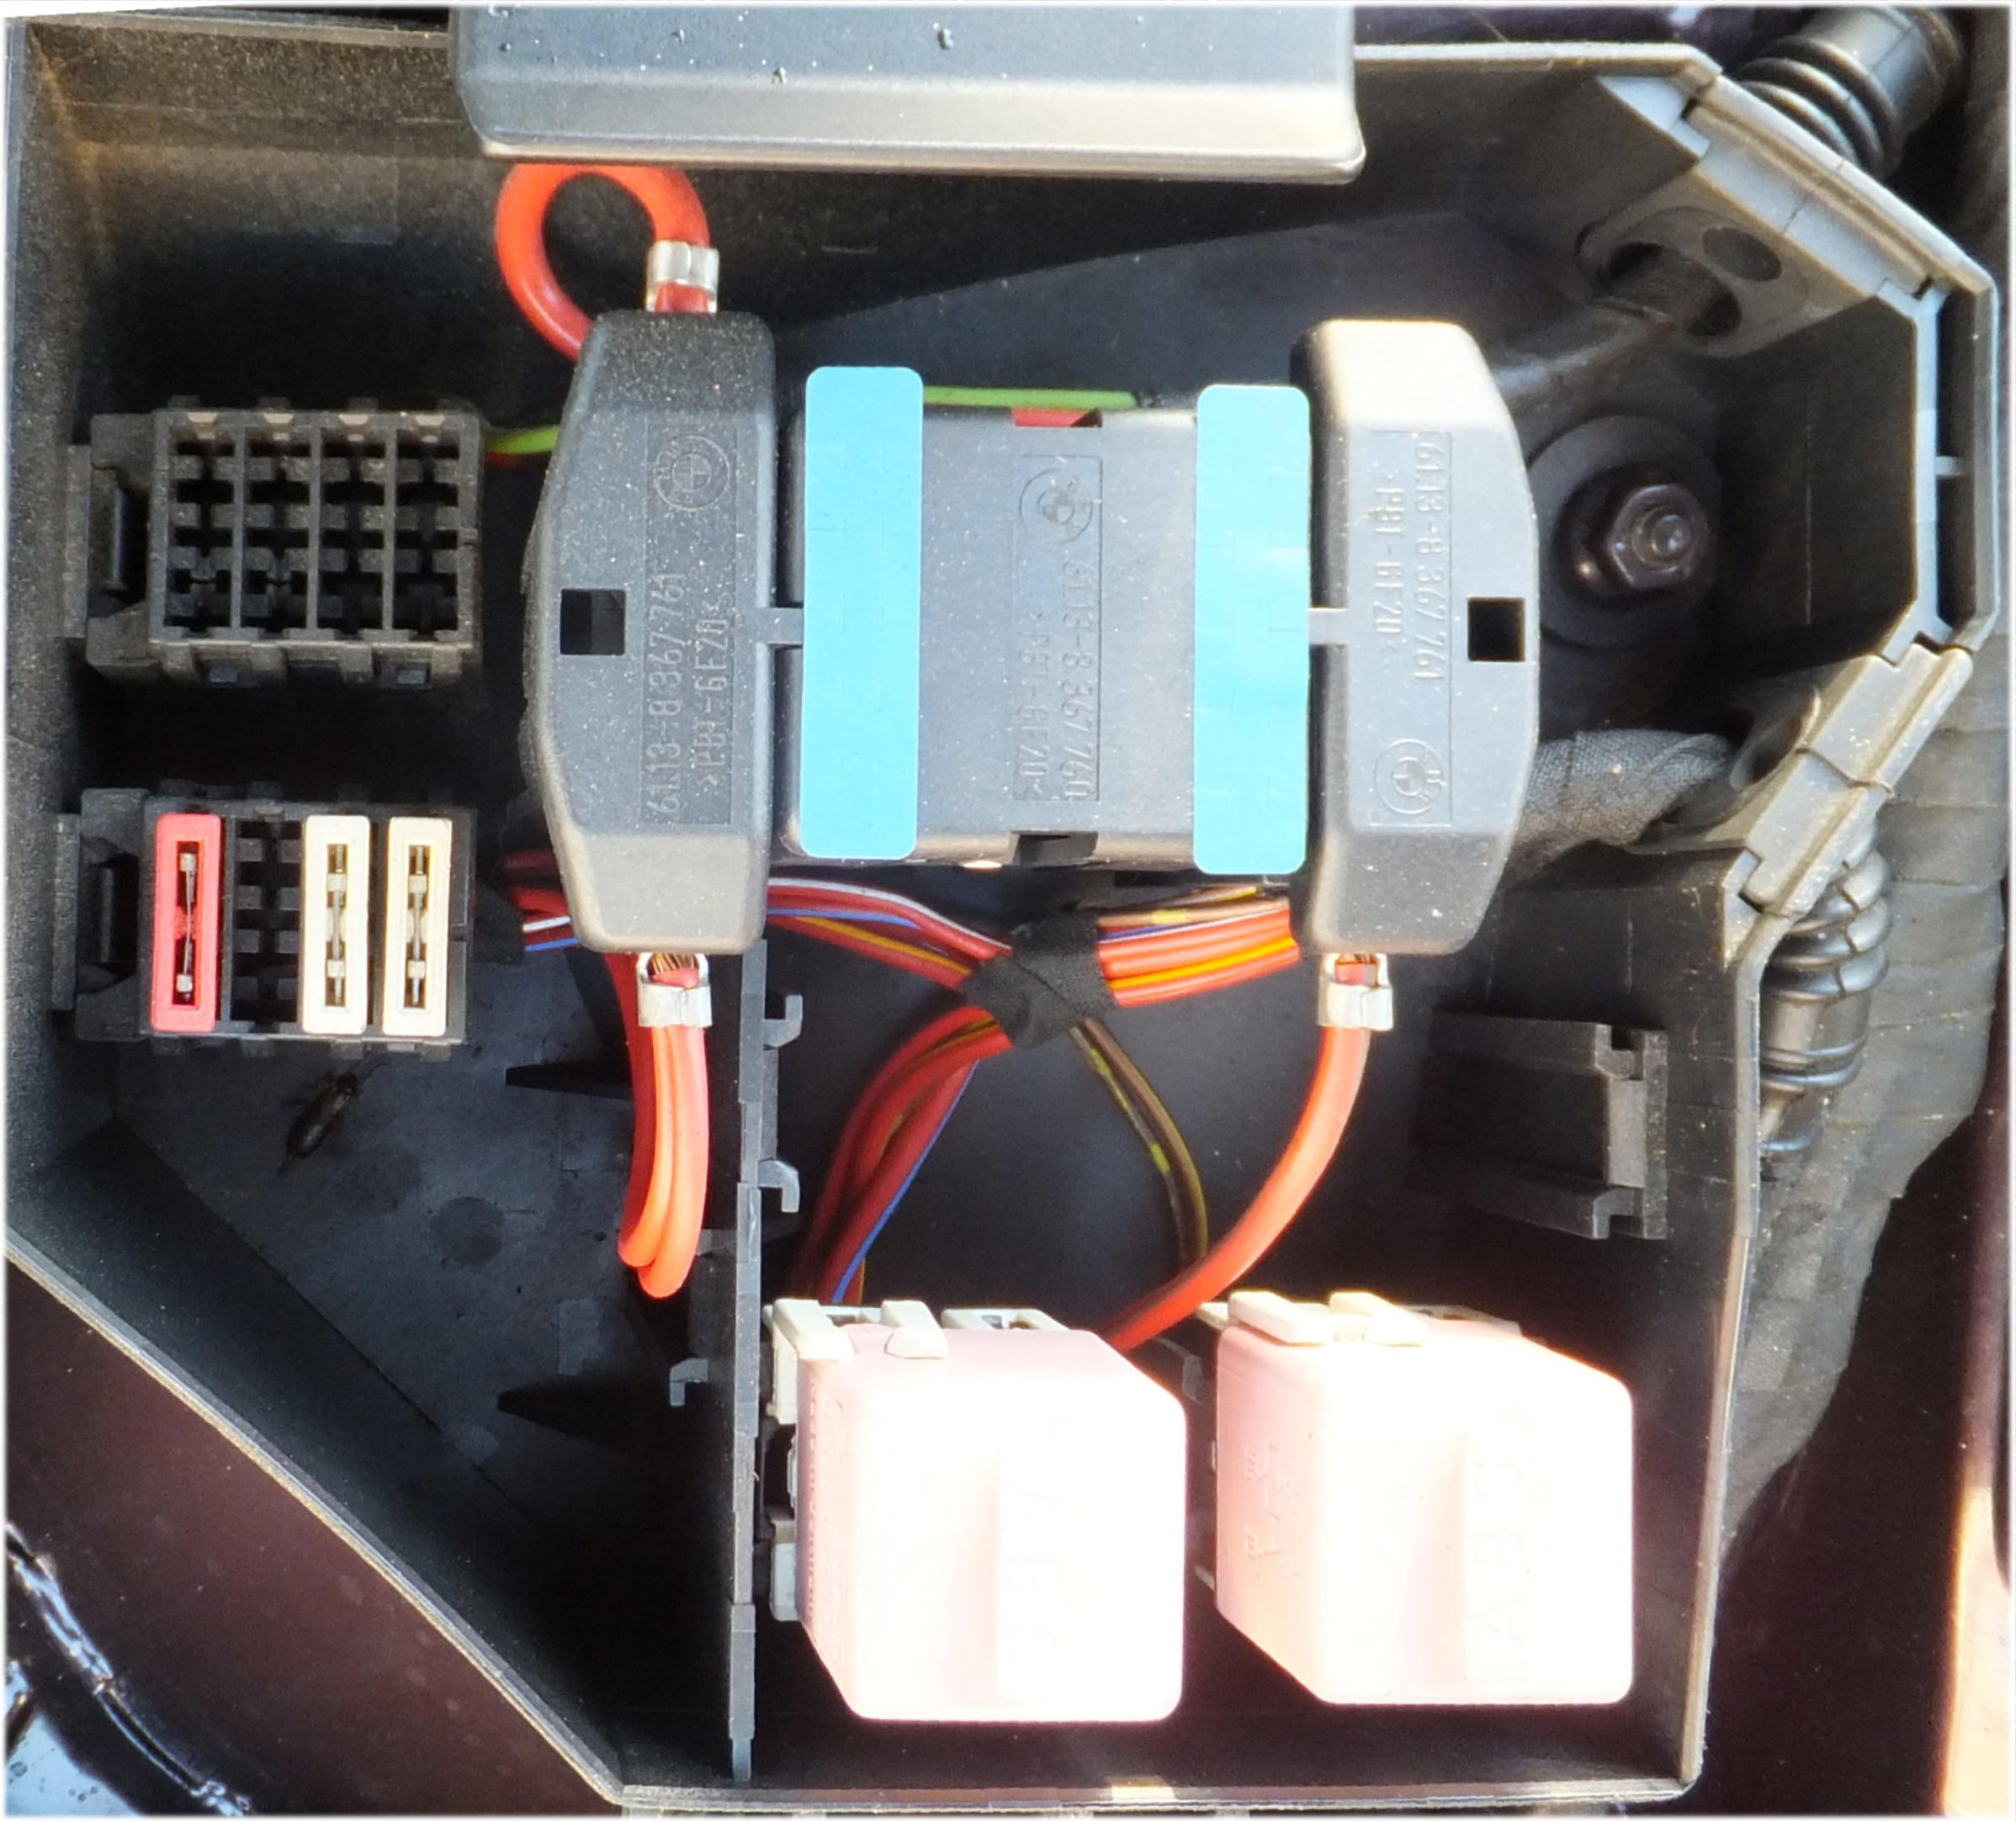 Bmw 850i Fuse Box Diagram Reinvent Your Wiring Midget Timms E31 Finder Rh Meeknet Co Uk 328i 1997